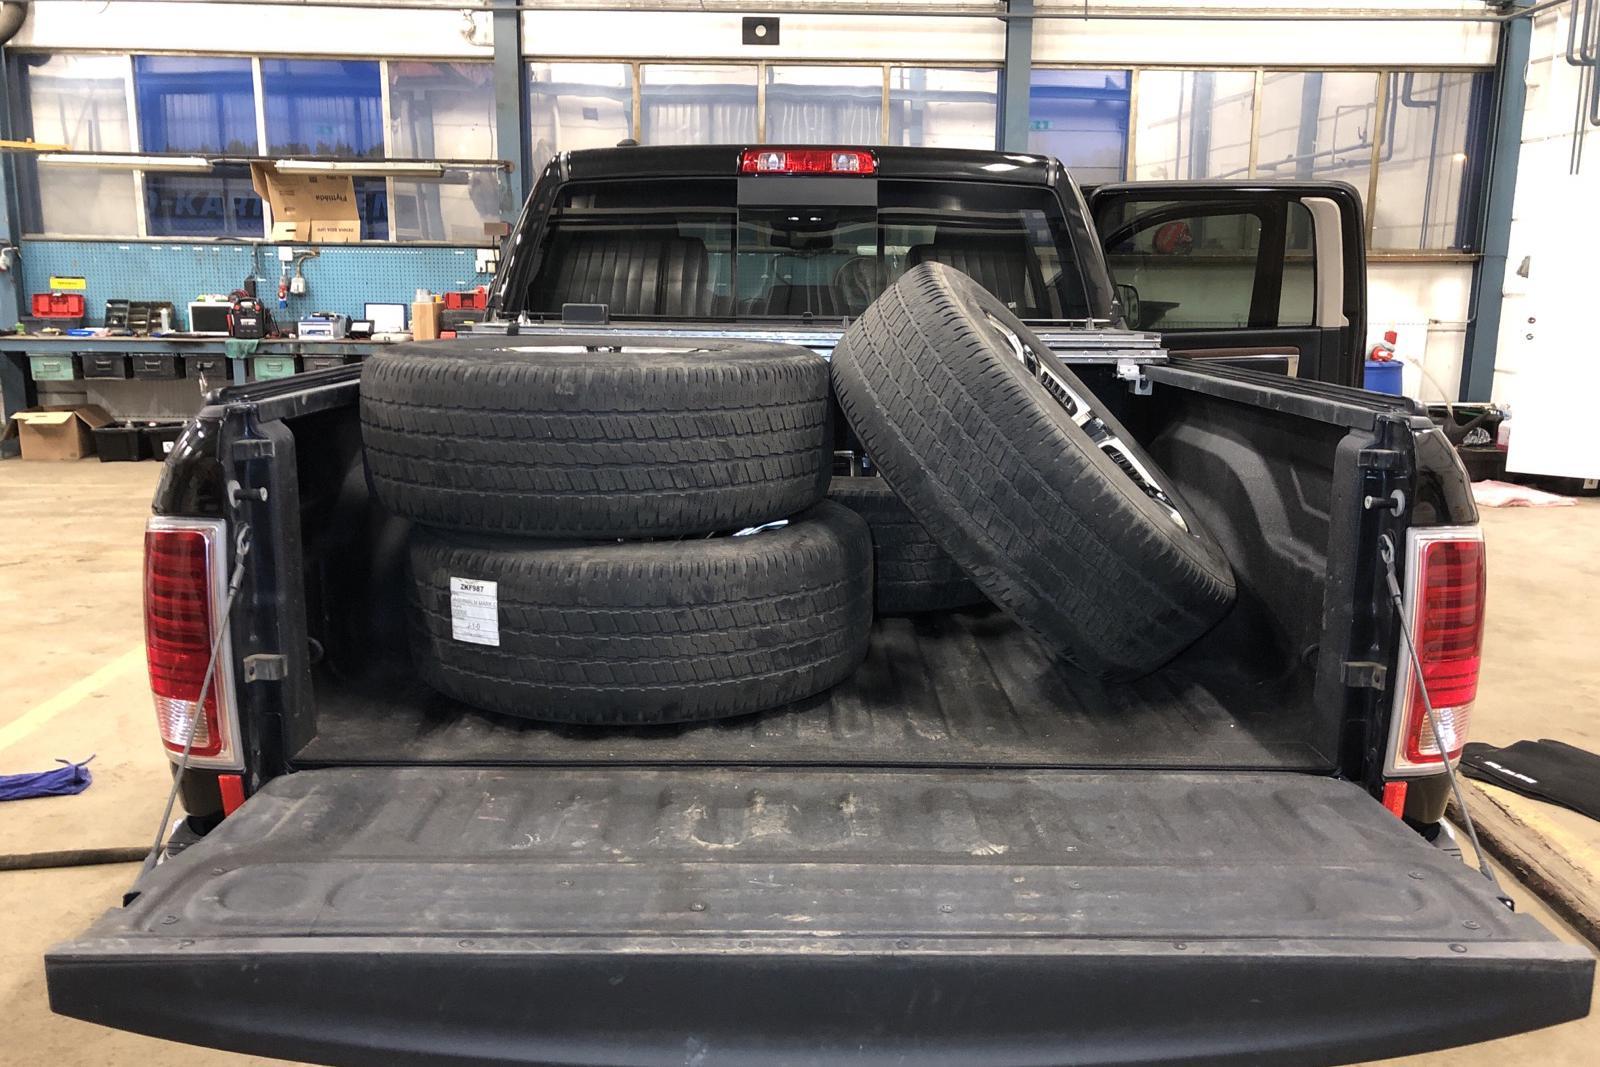 Dodge RAM 1500 3.0 4WD (243hk) - 60 750 km - Automatic - black - 2017